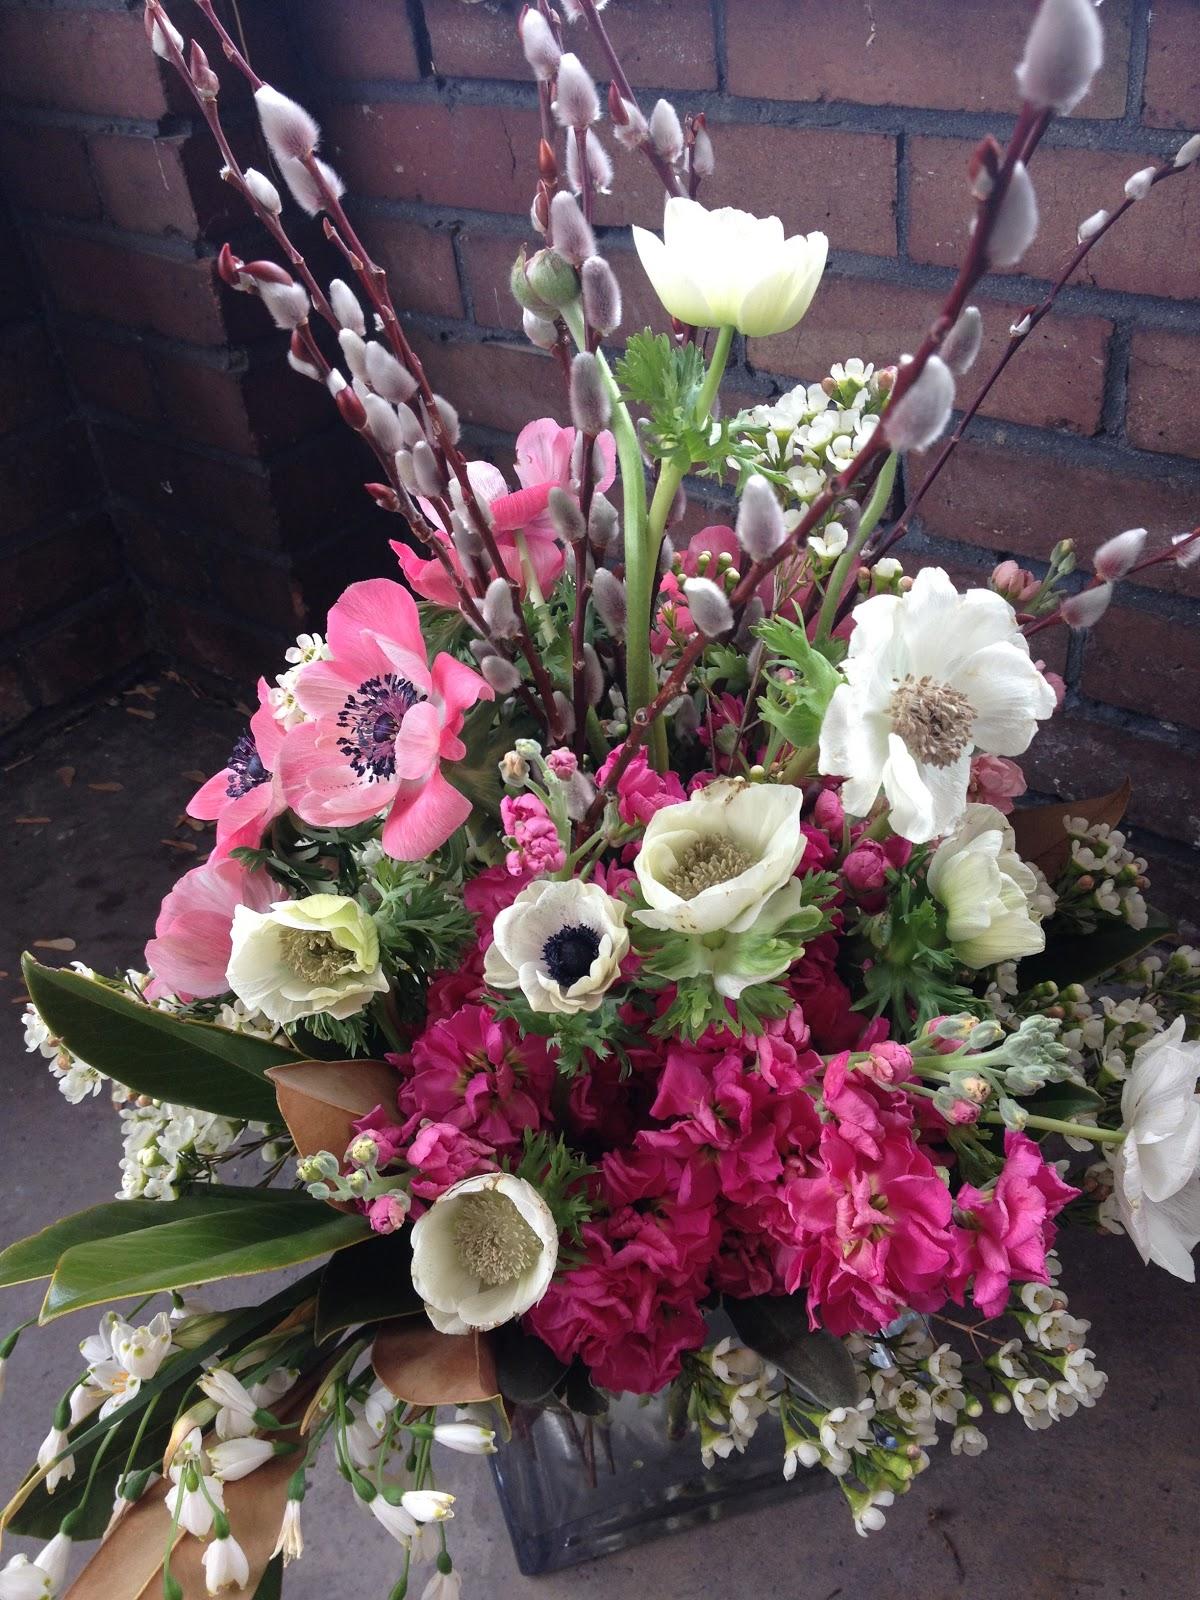 Birthday flowers for Mom